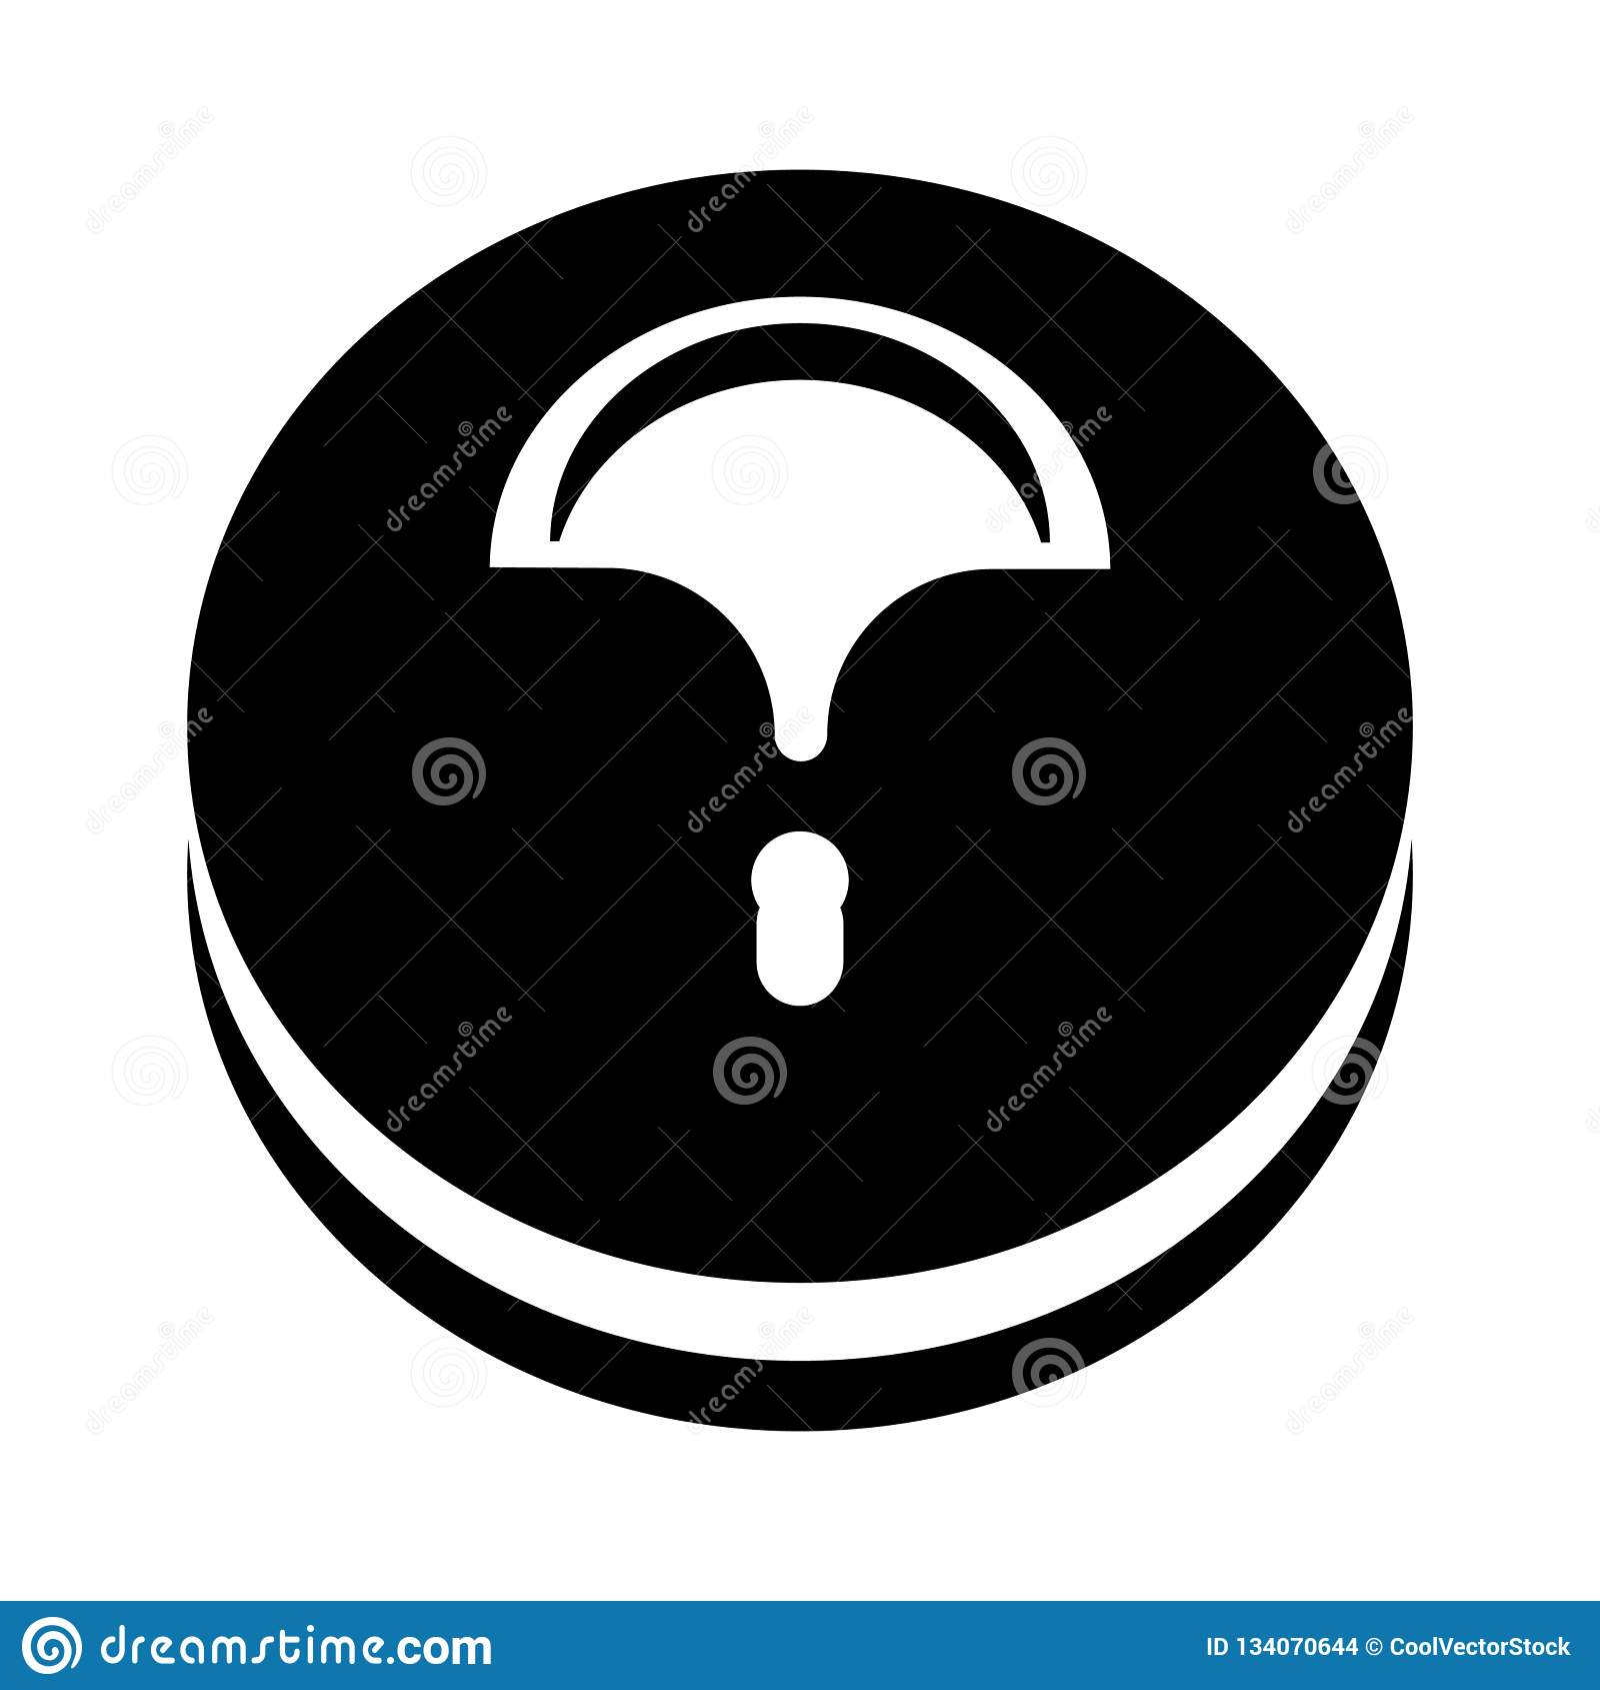 Знак и символ вектора значка сумки Hobo изолированные на белой предпосылке, концепции логотипа сумки Hobo